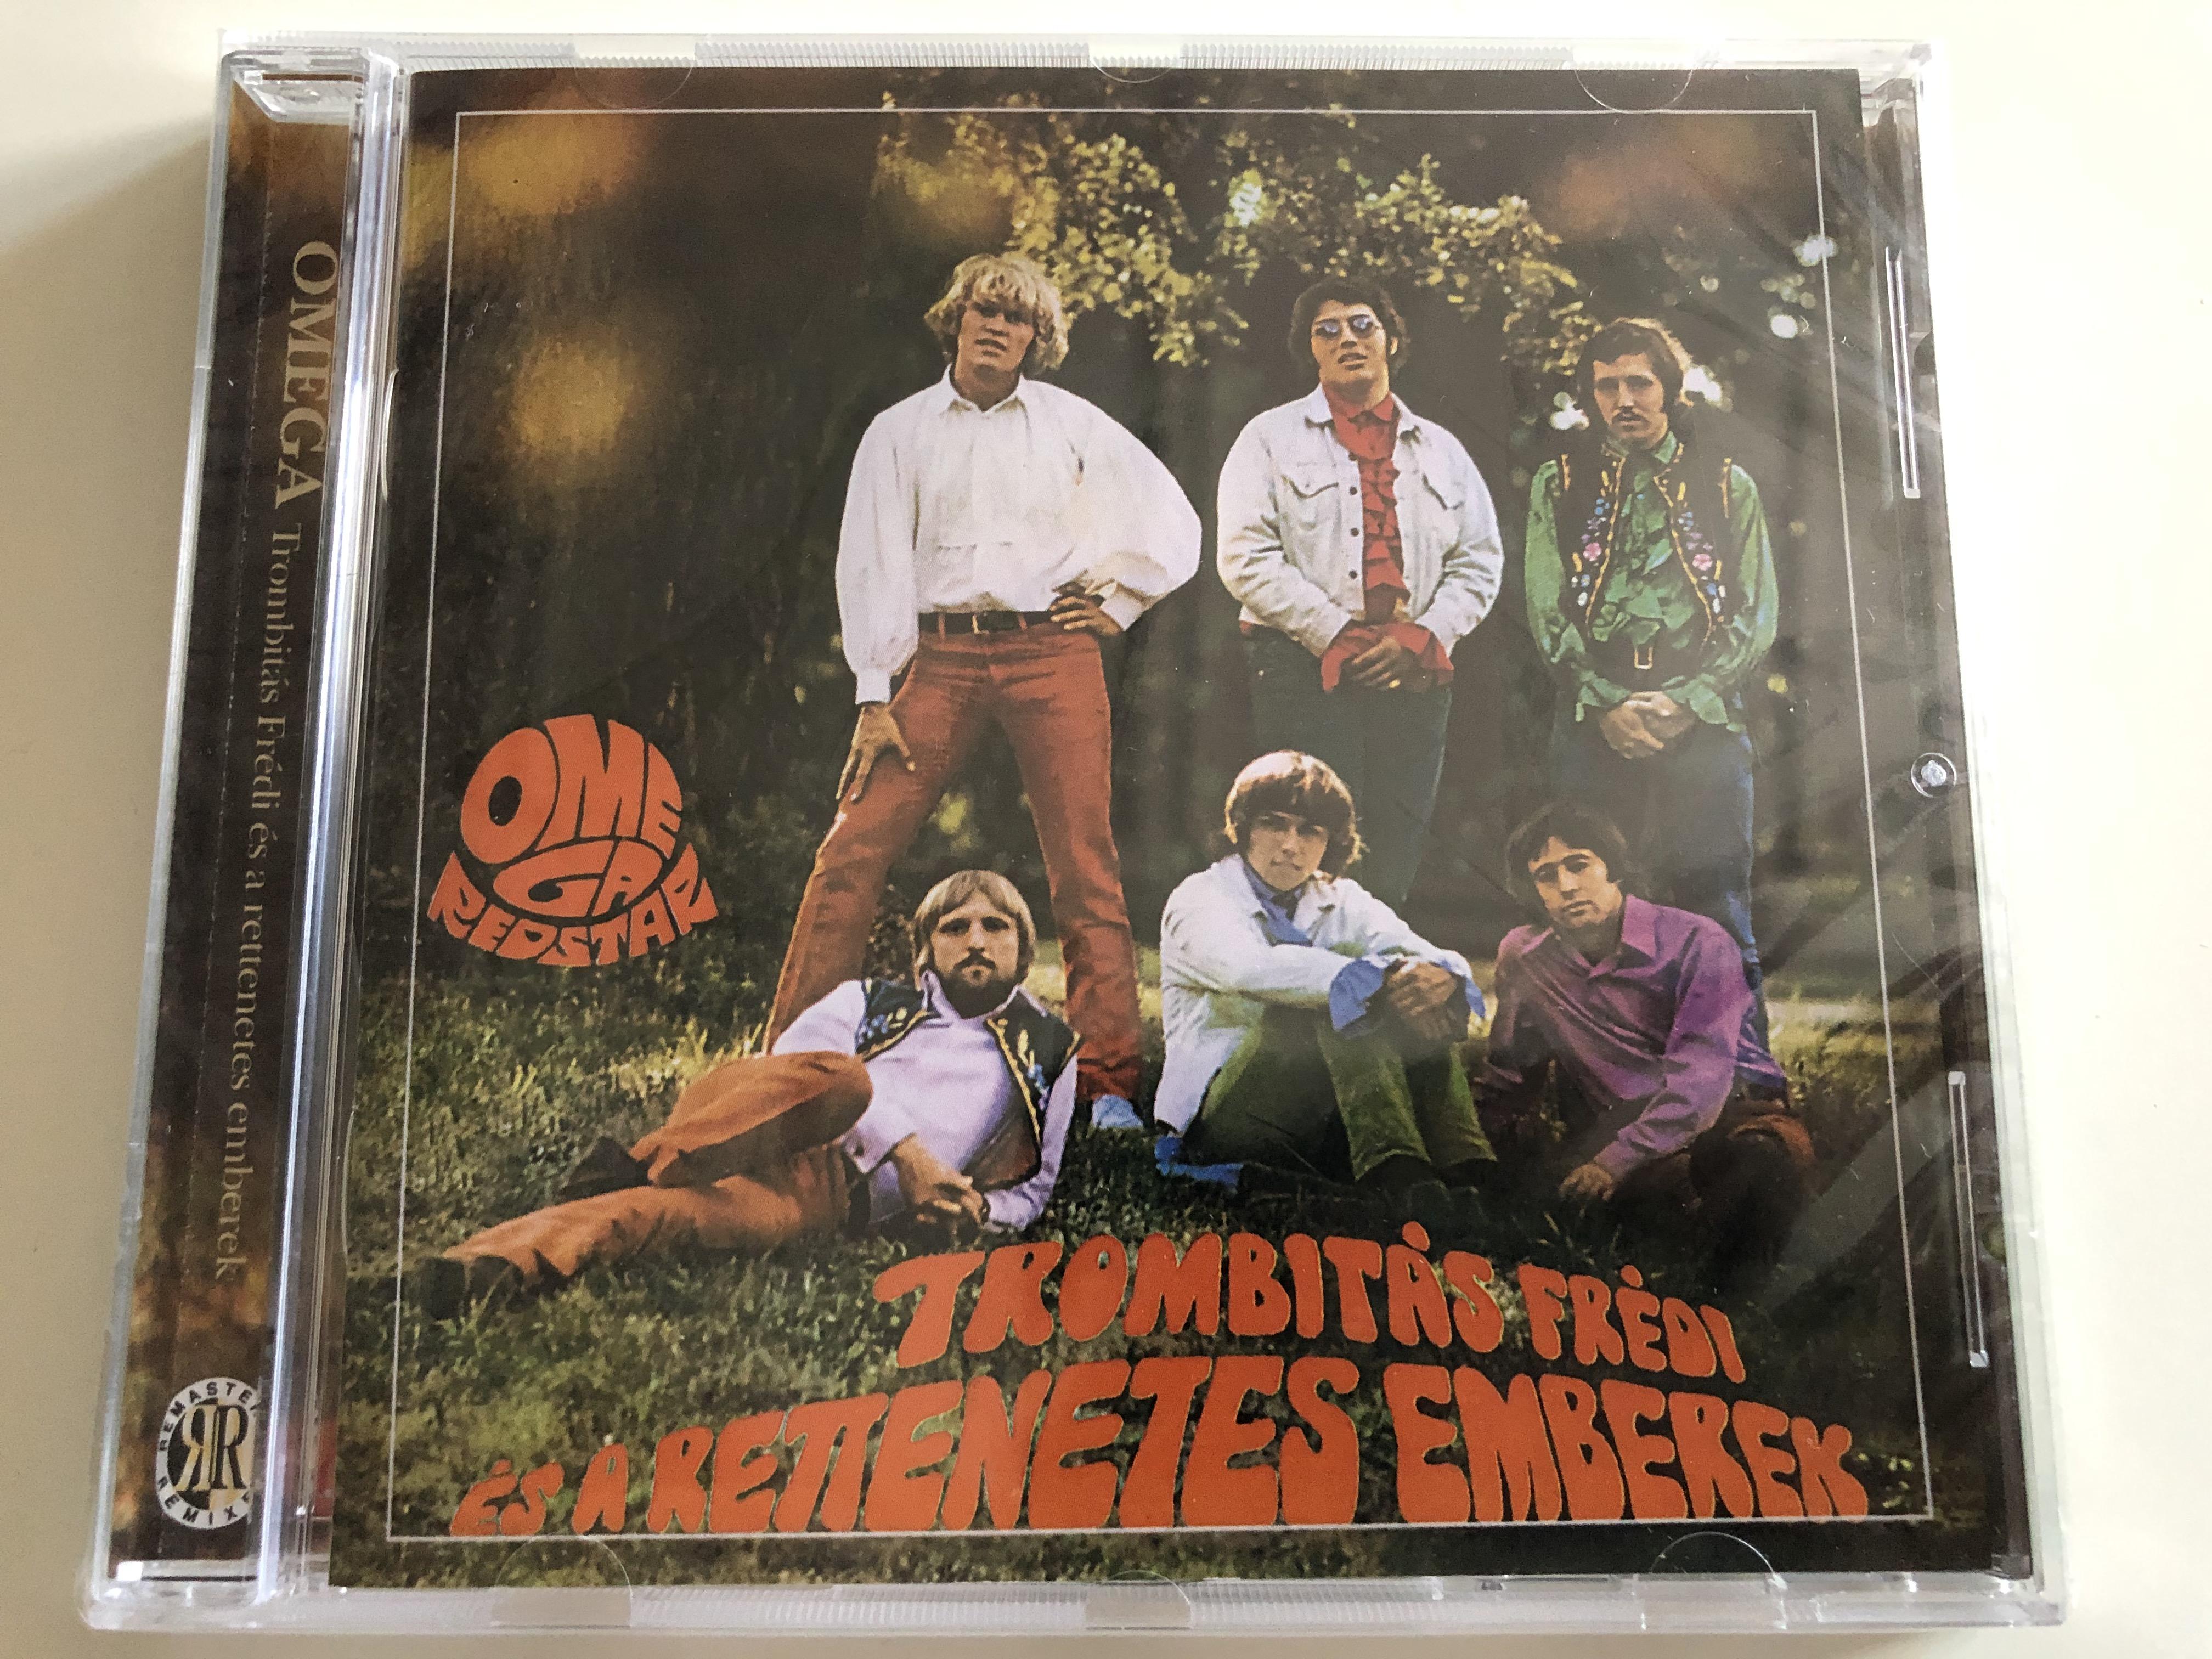 trombit-s-fr-di-s-a-rettenetes-emberek-omega-hungaroton-audio-cd-2003-hcd-17390-1-.jpg